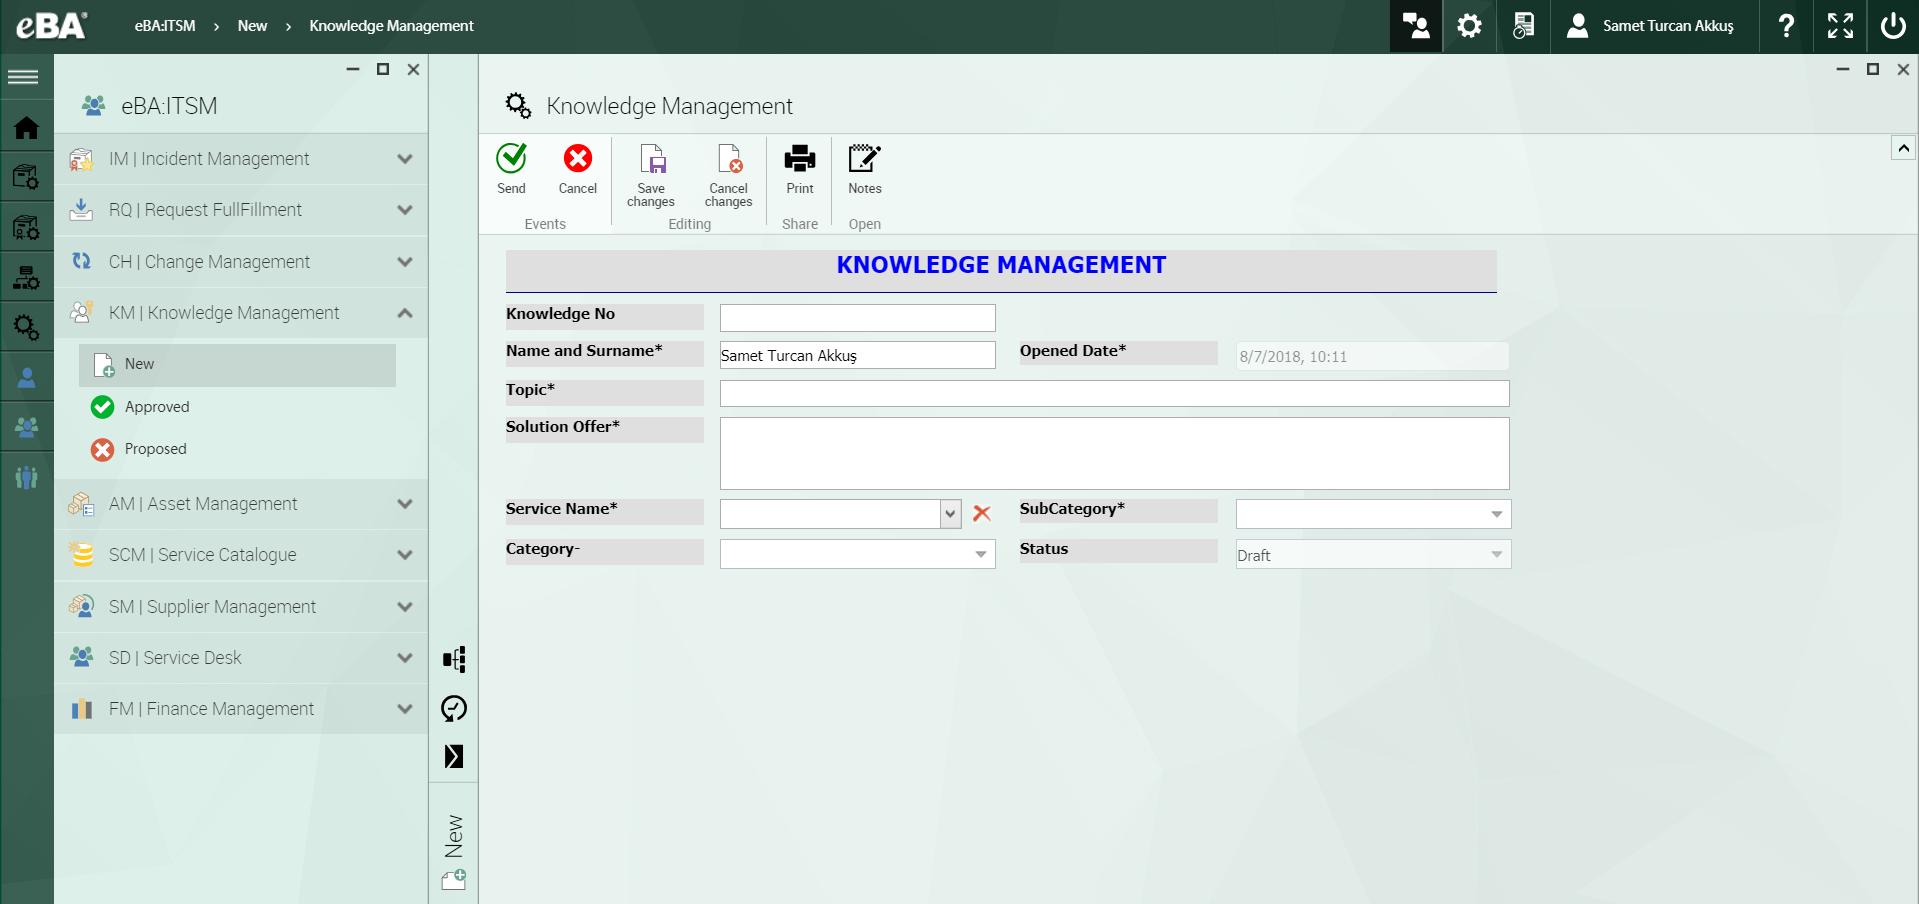 eBA ITSM Software - Knowledge management